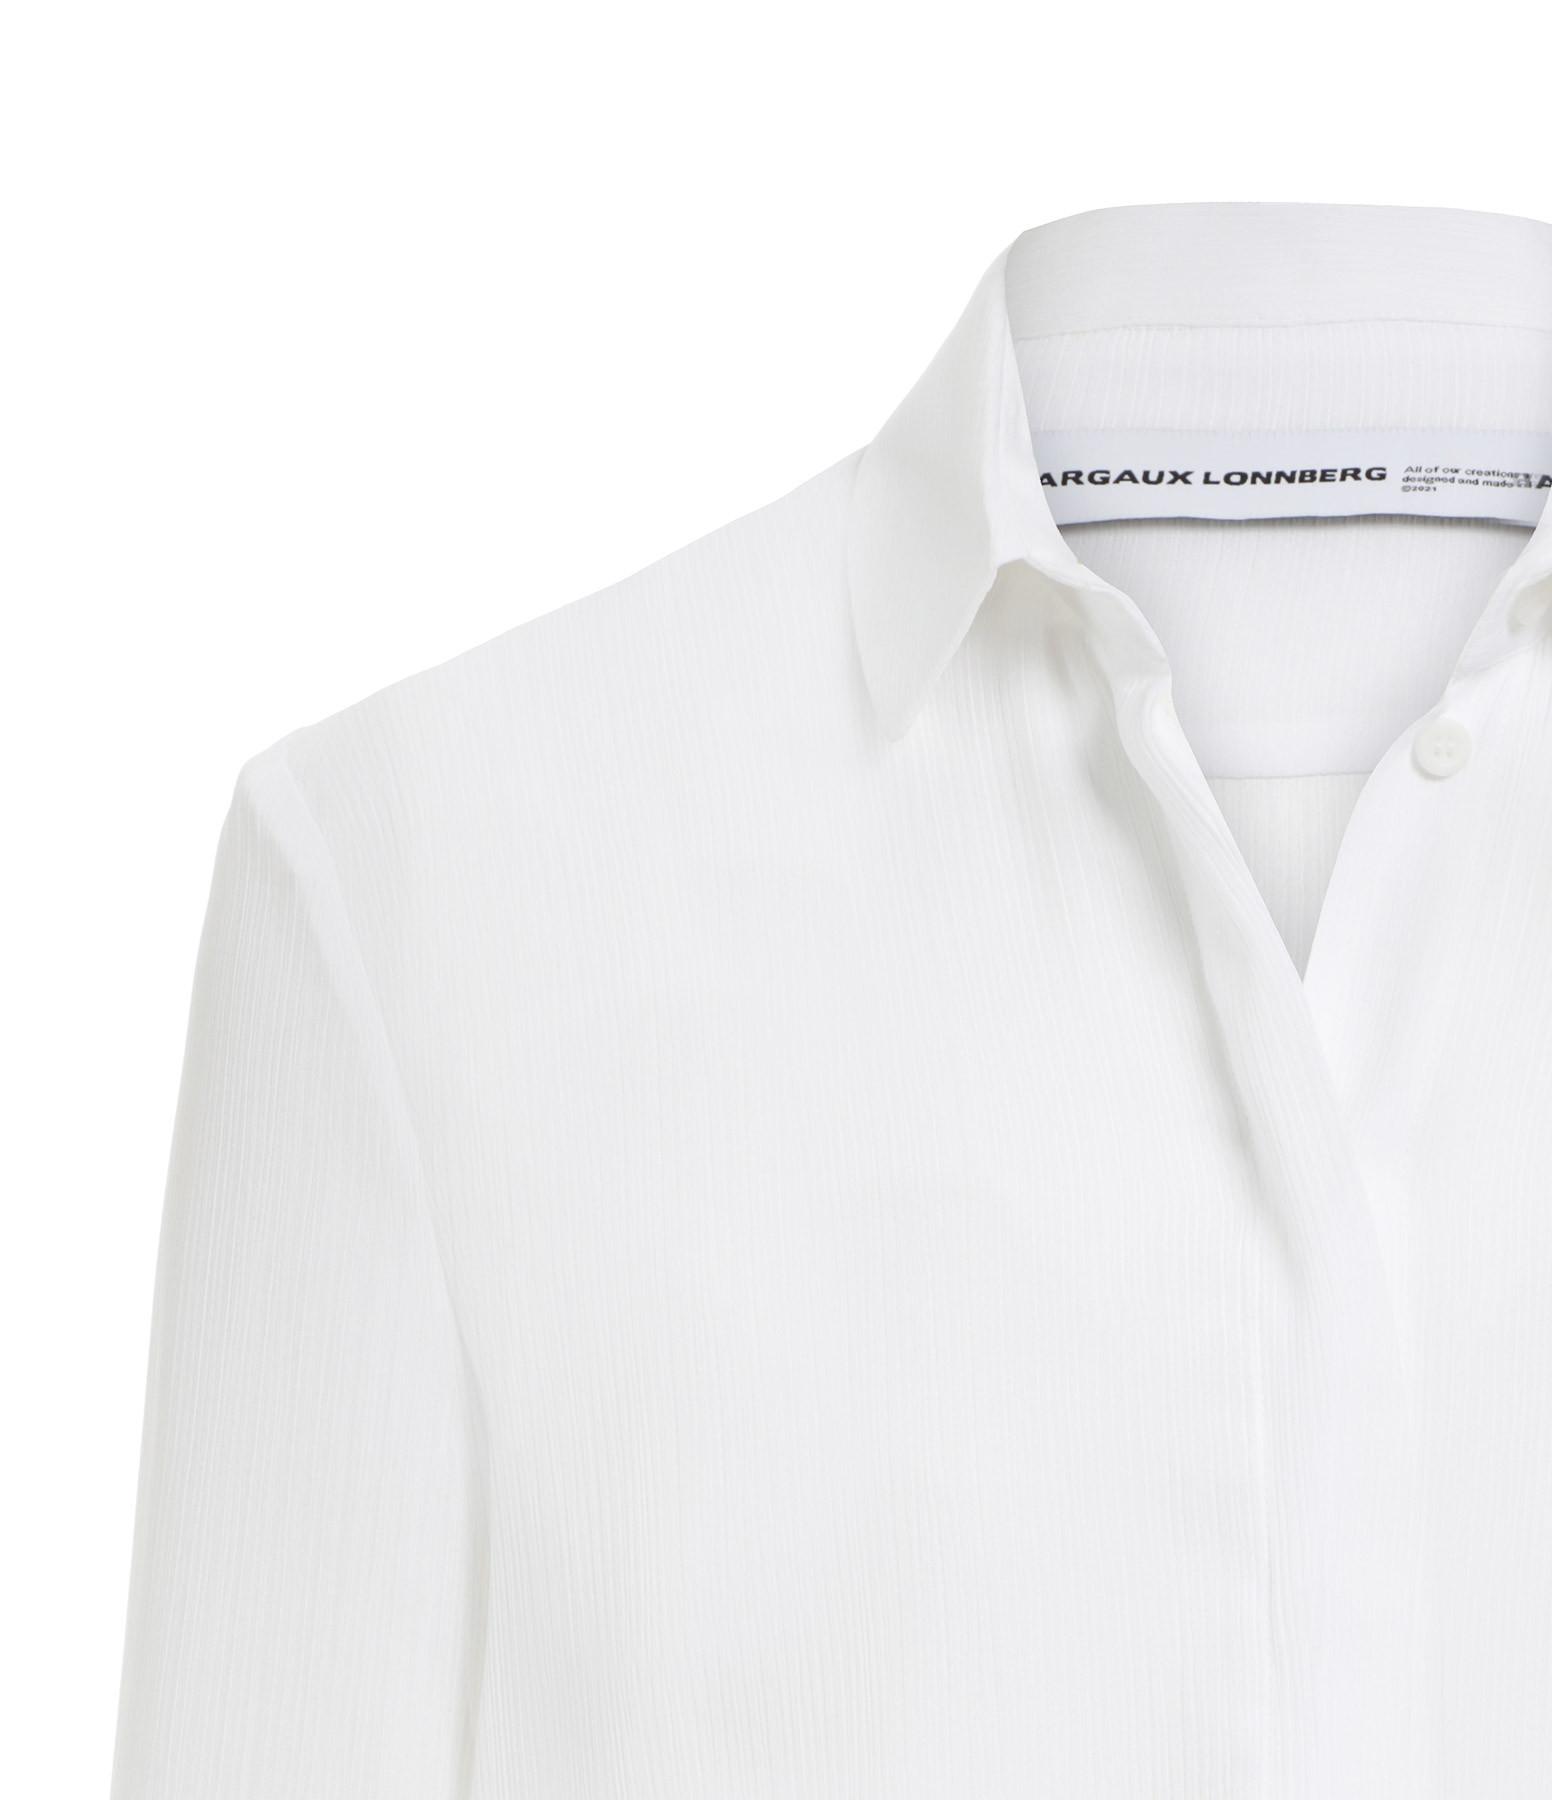 MARGAUX LONNBERG - Chemise Ward Blanc